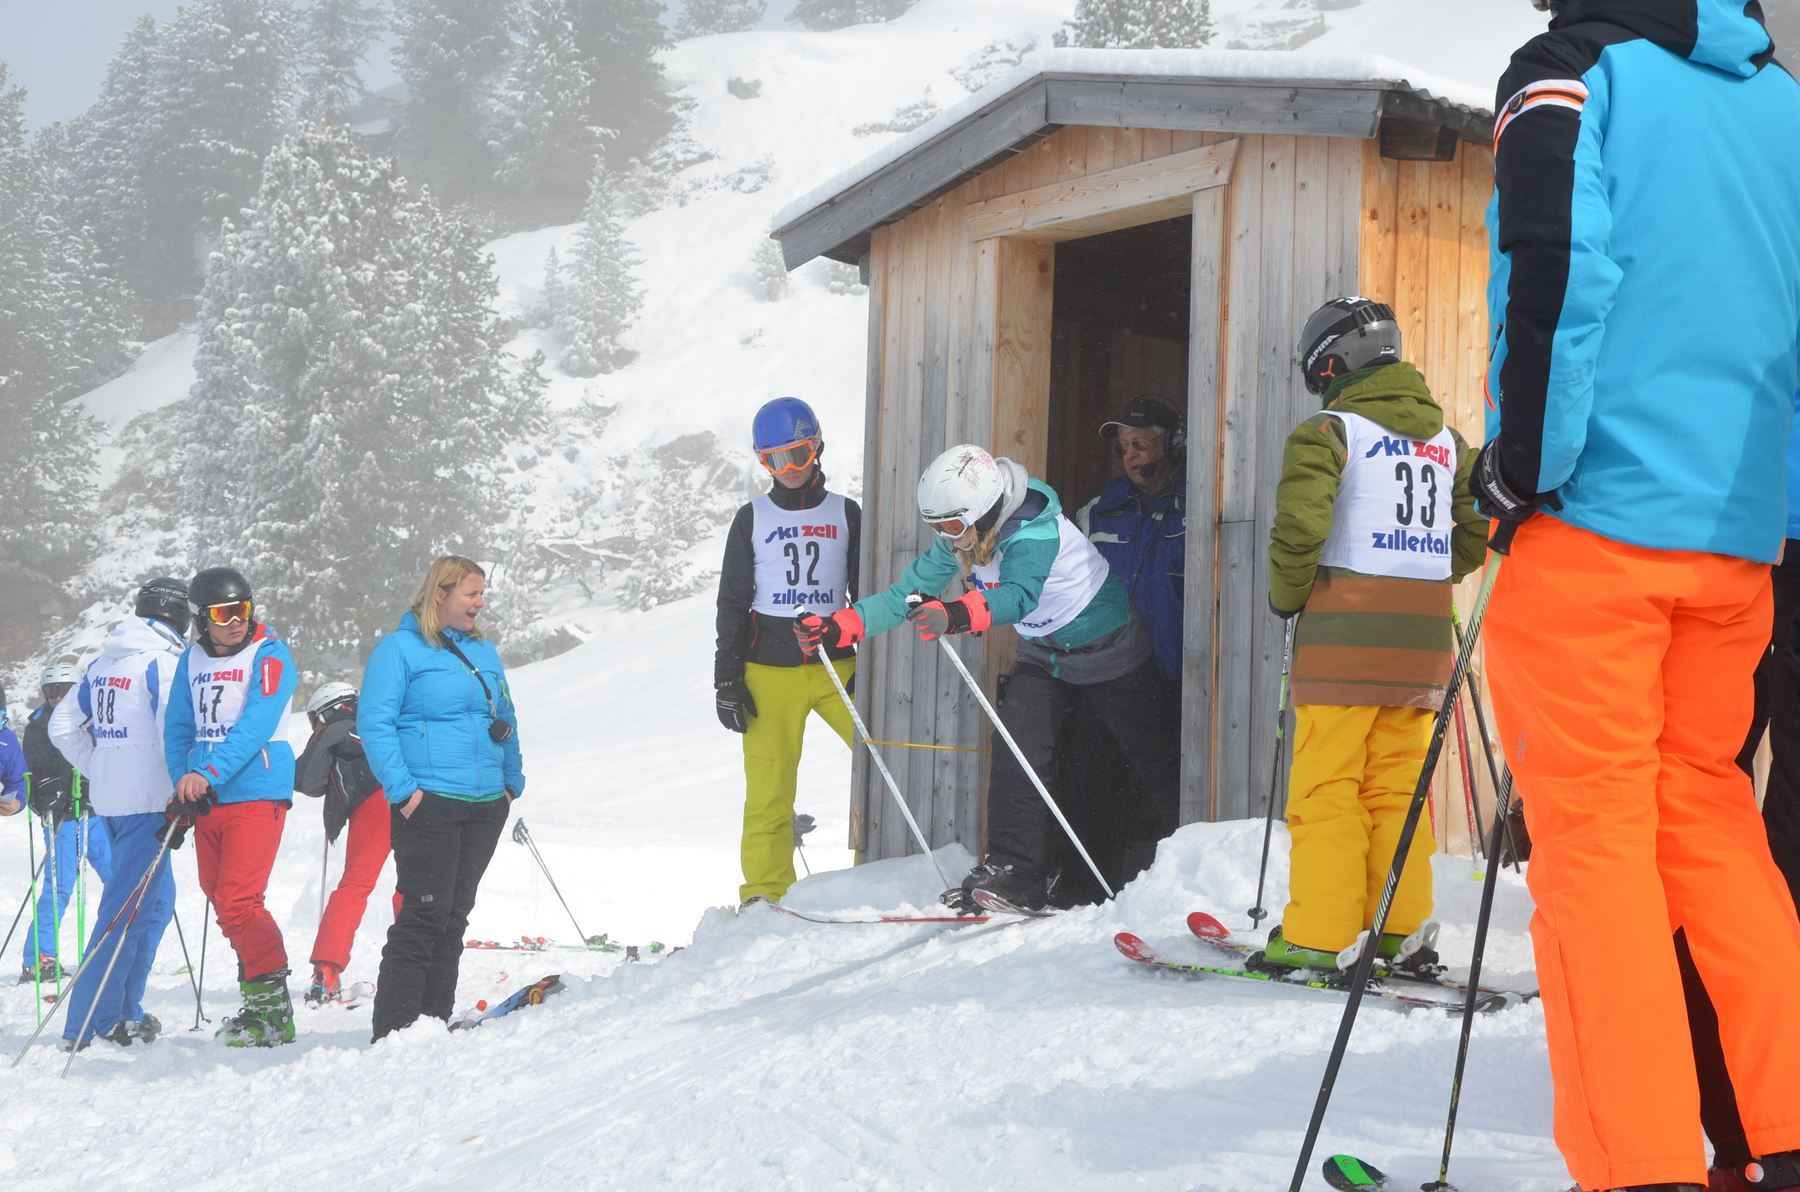 2015-03-22 BV Zillertal Skirennen 098.JPG